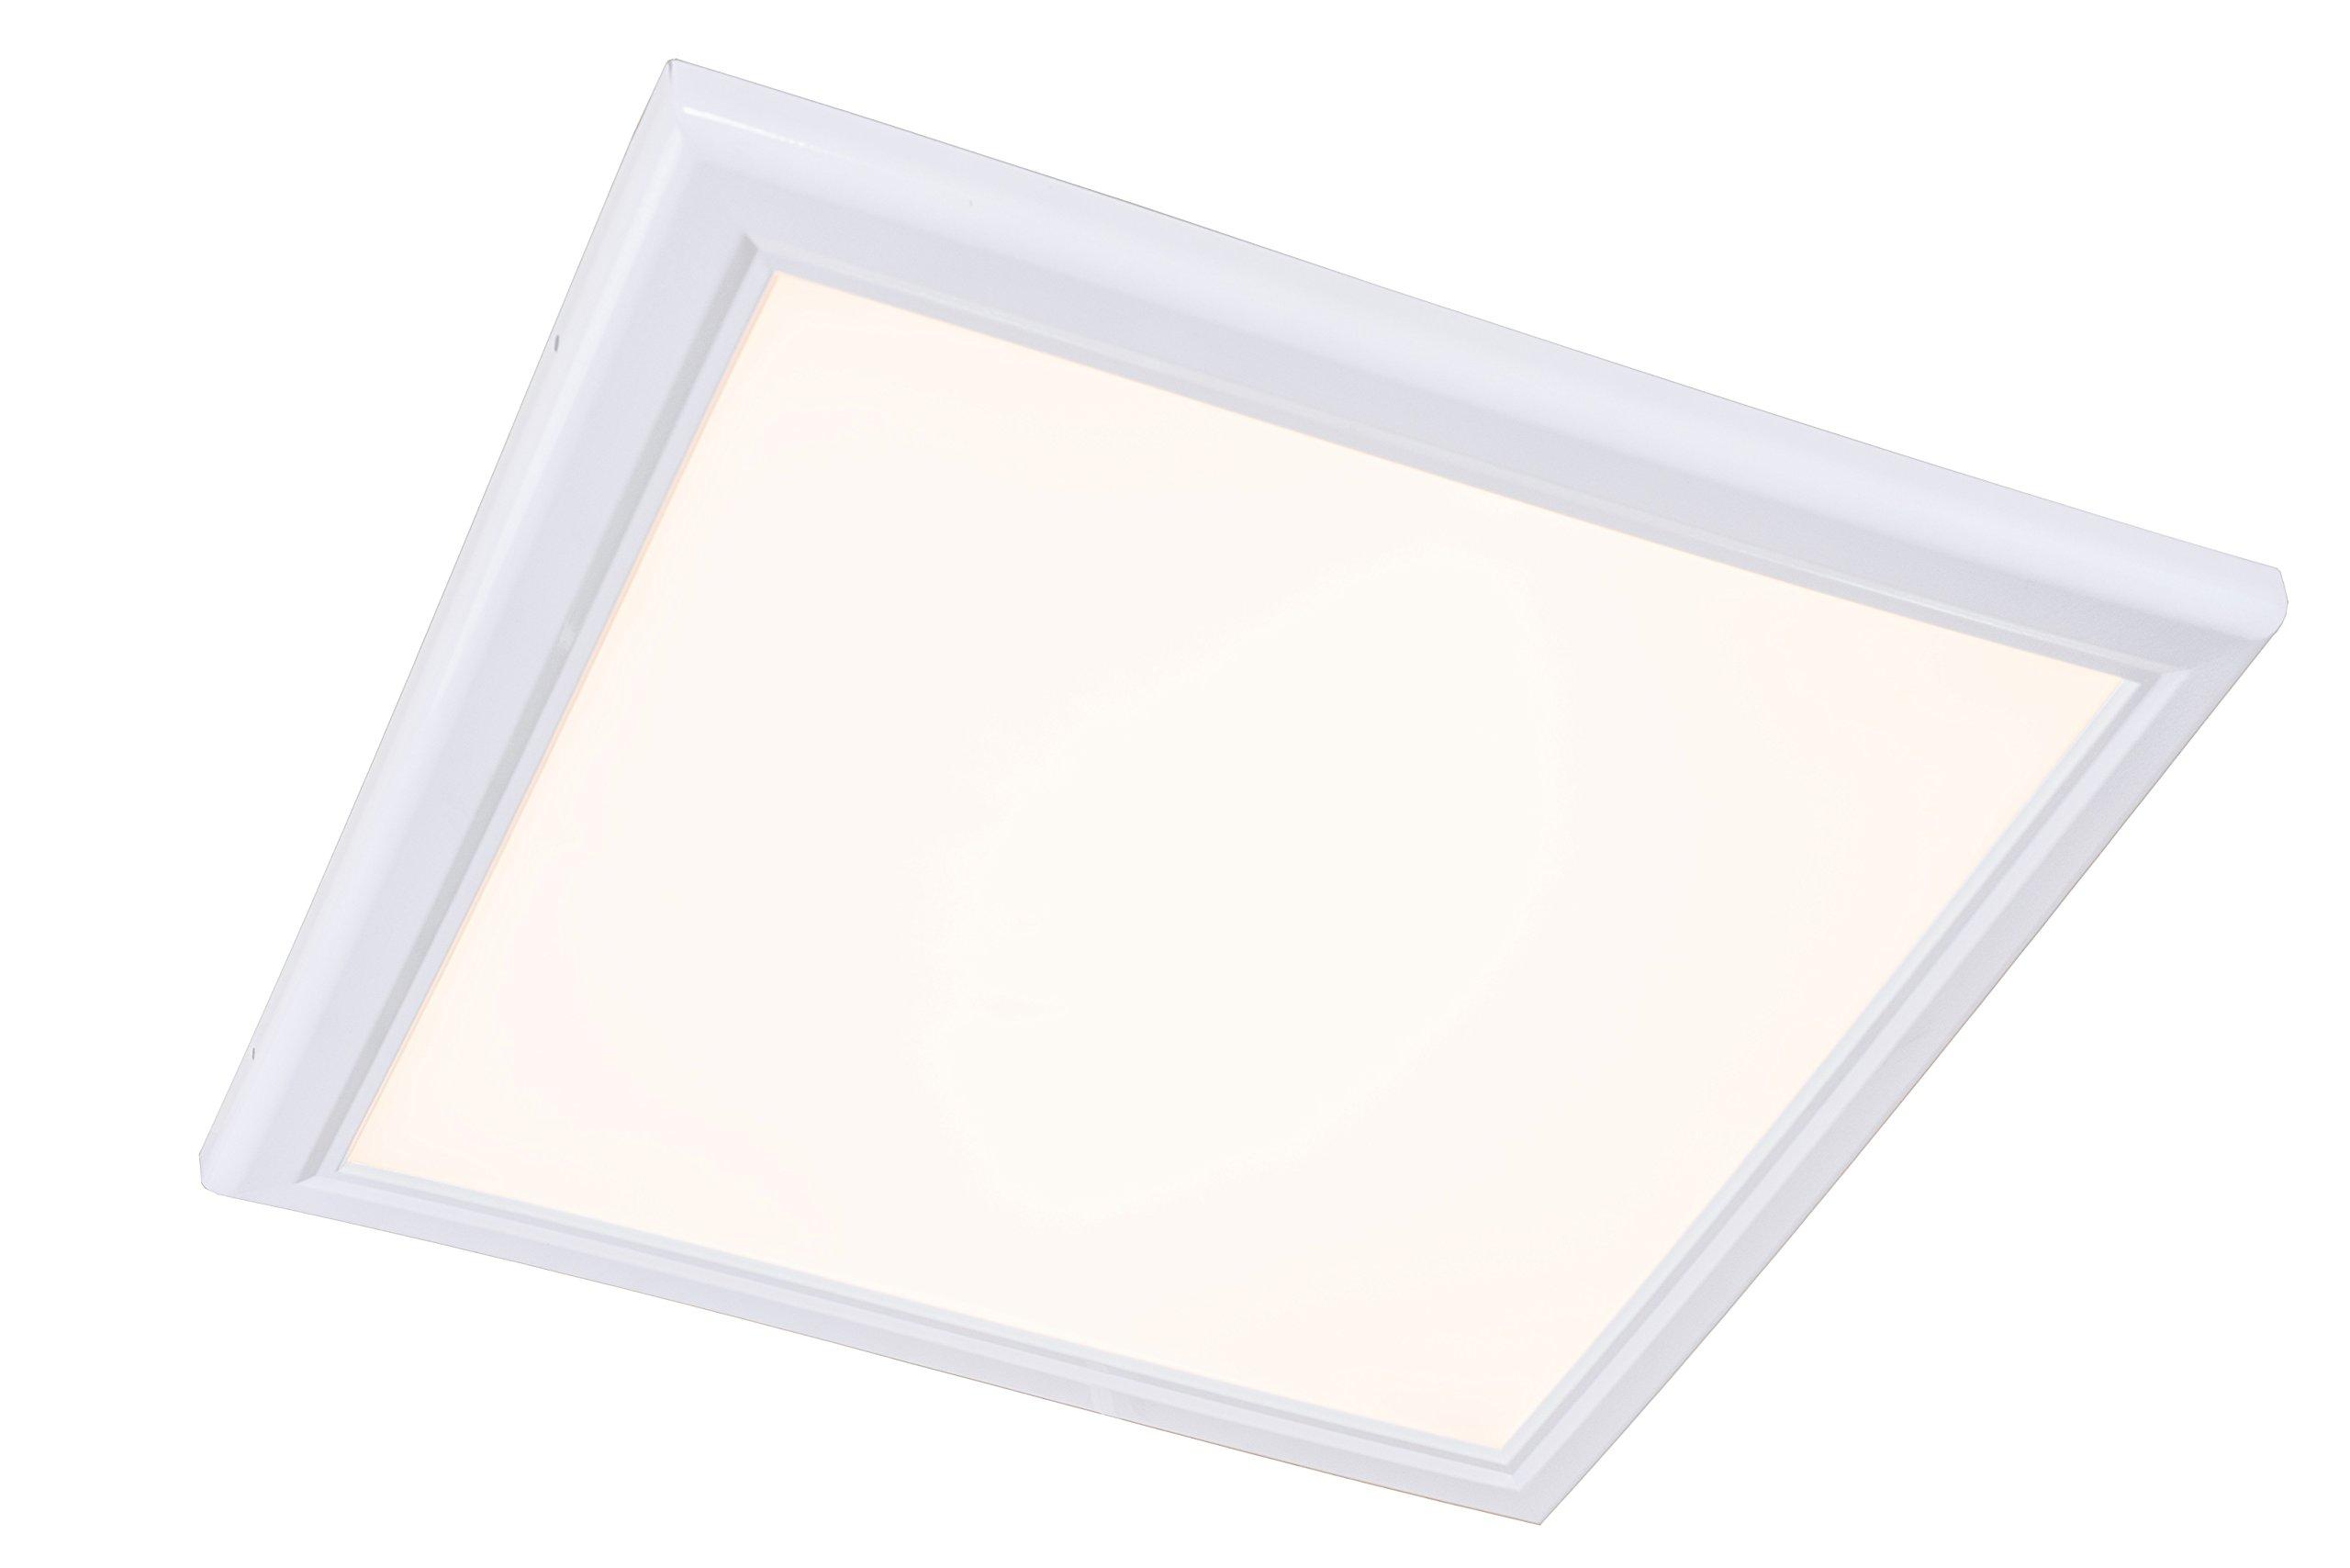 2'X2' LED Flat Panel Flush Mount Troffer Light Fixture Warm 2700K 60Watt 110-277V